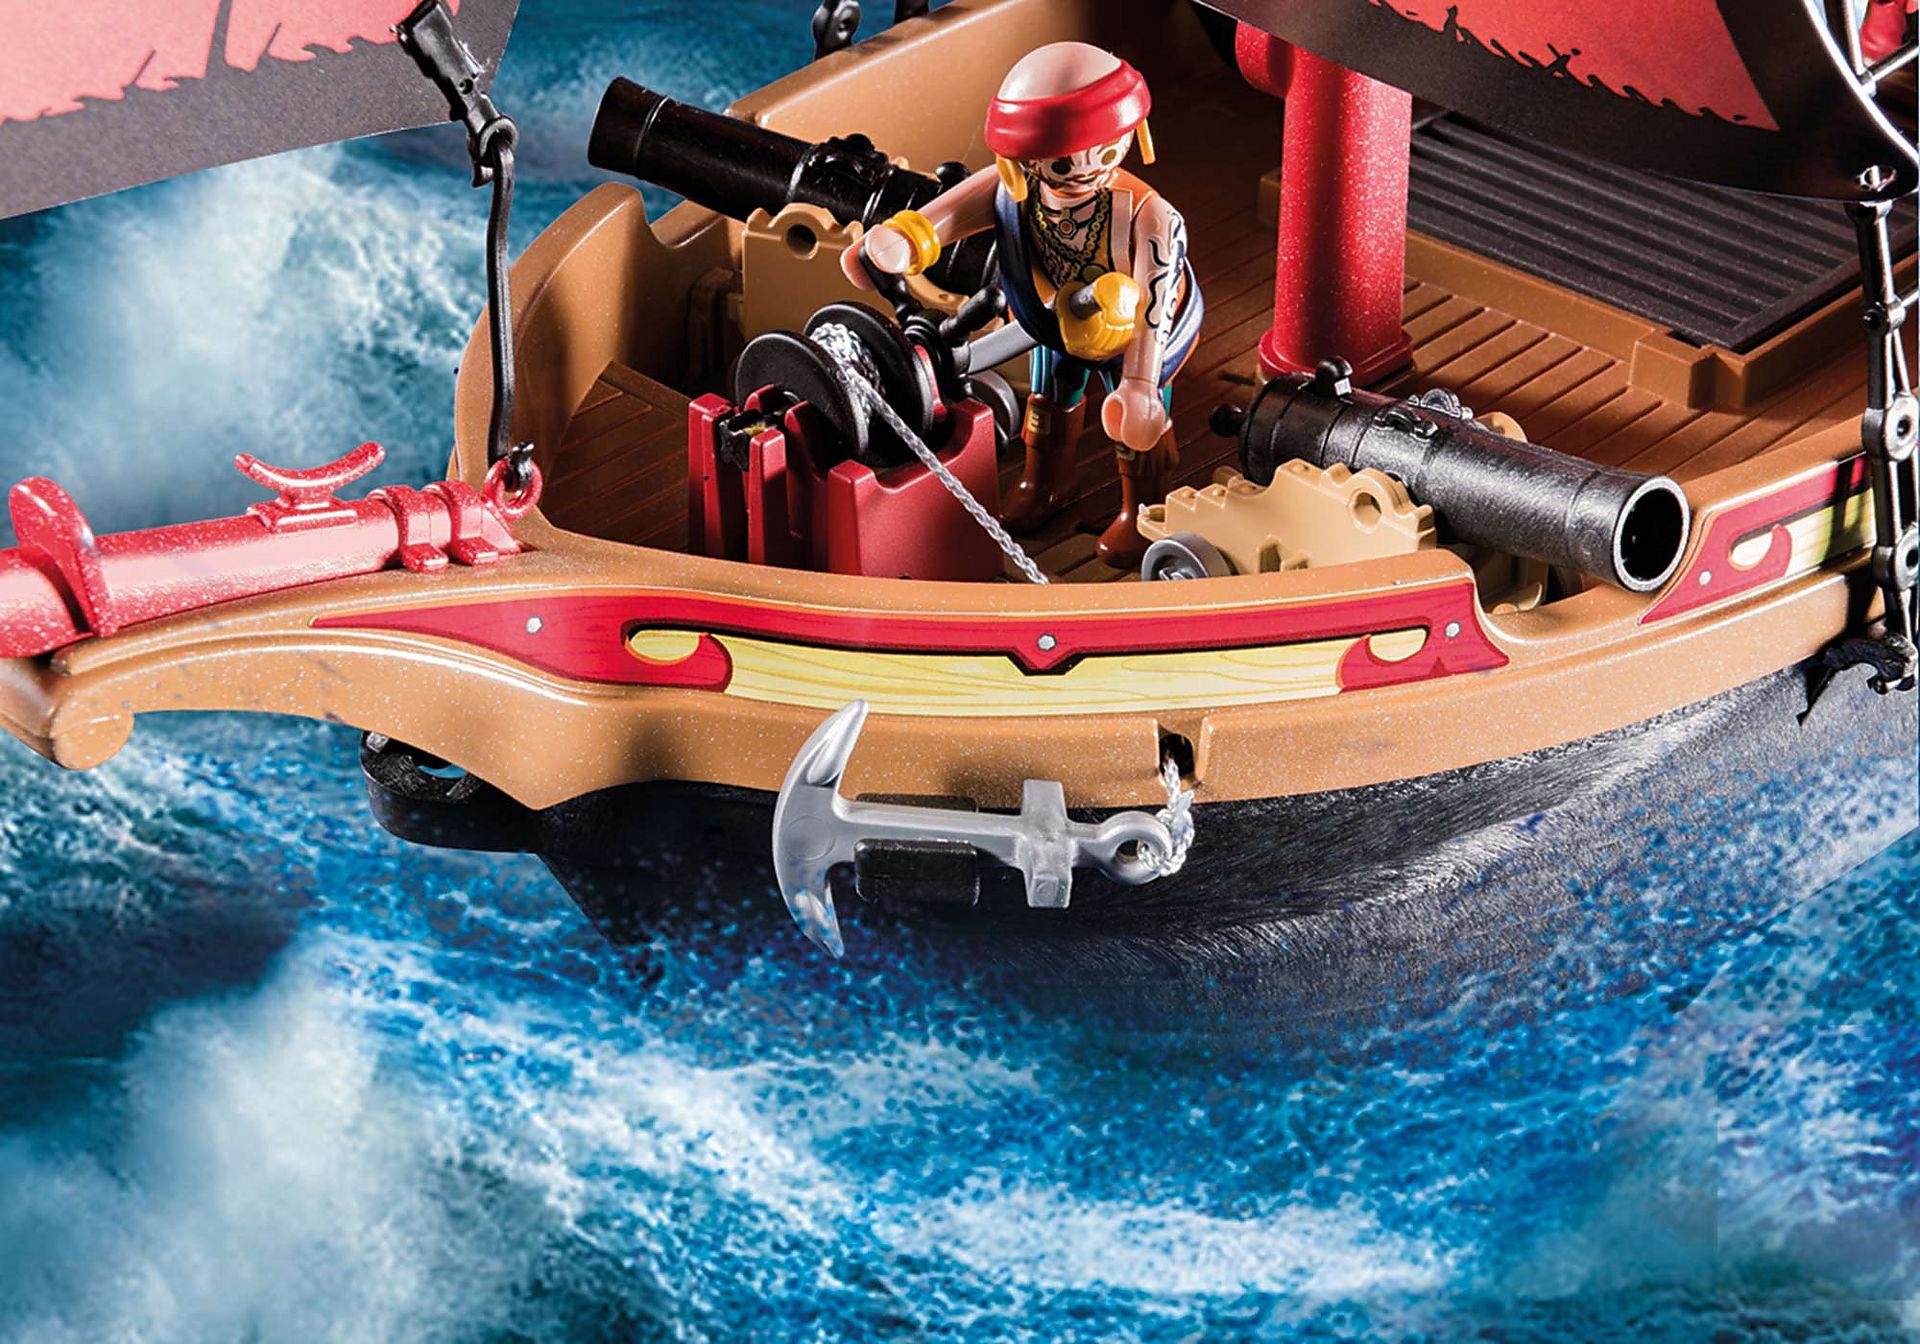 70411 Pirate Ship zoom image8